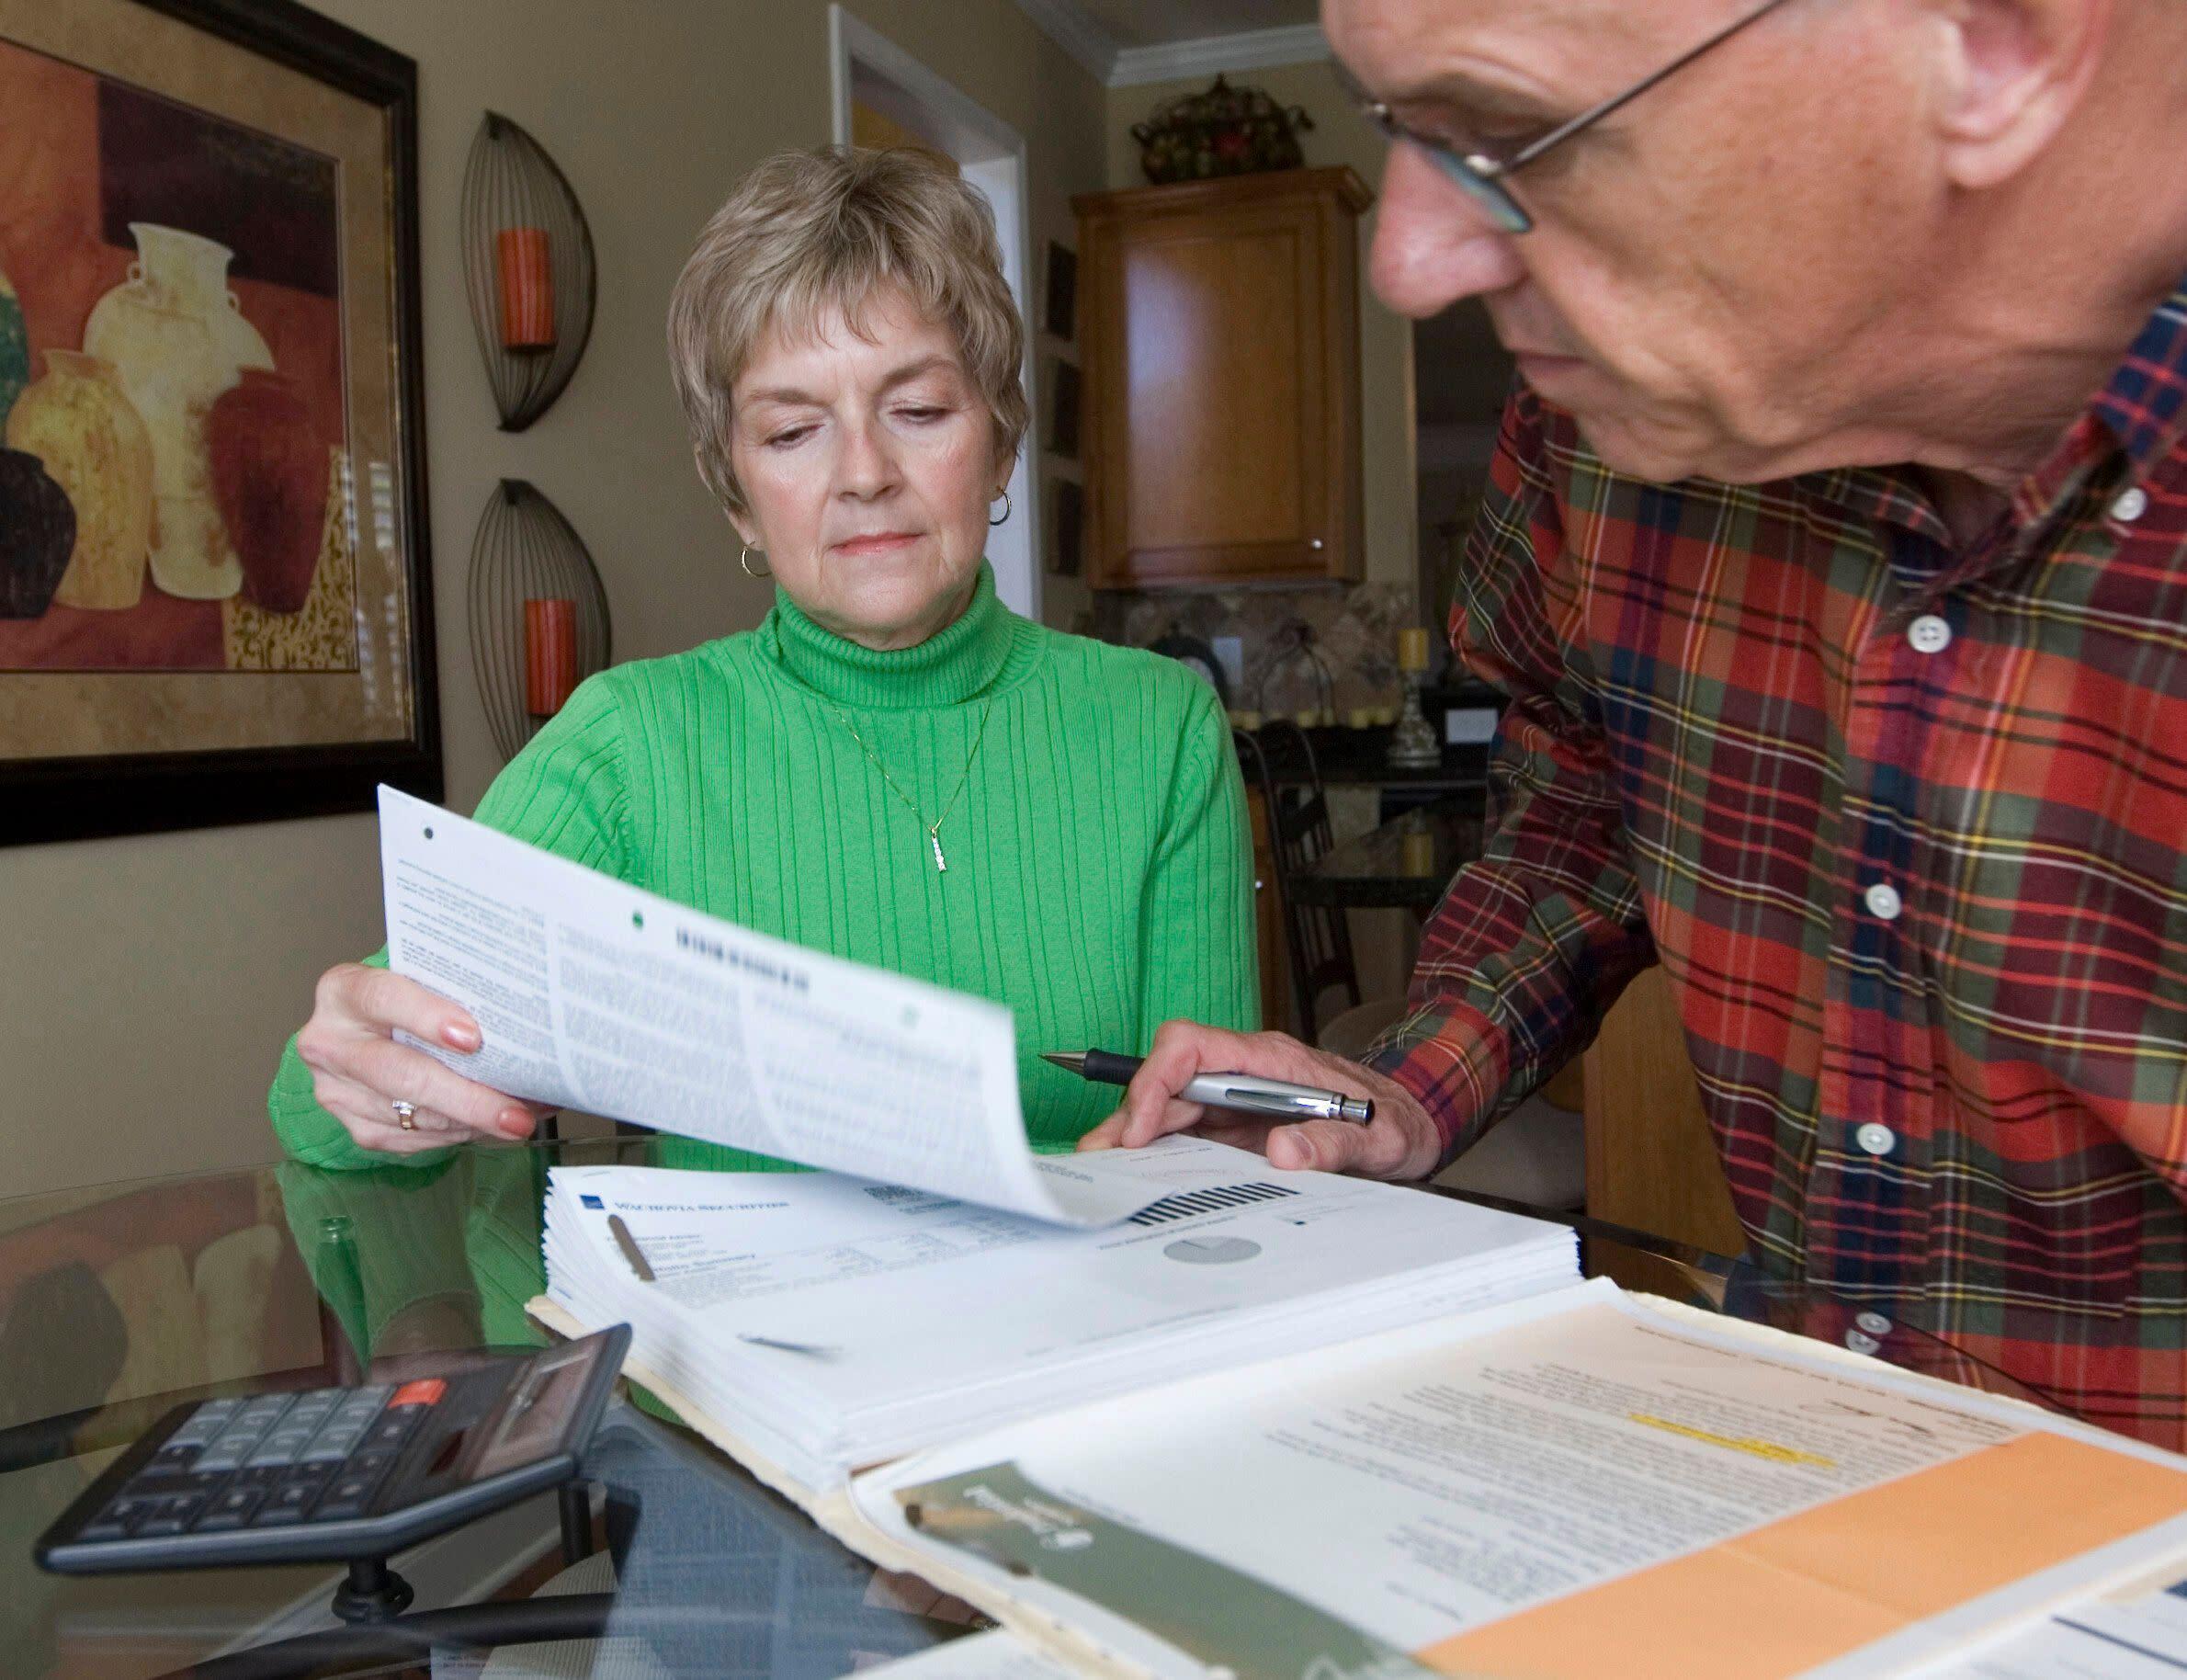 Study: Parents skimp on retirement to support adult children